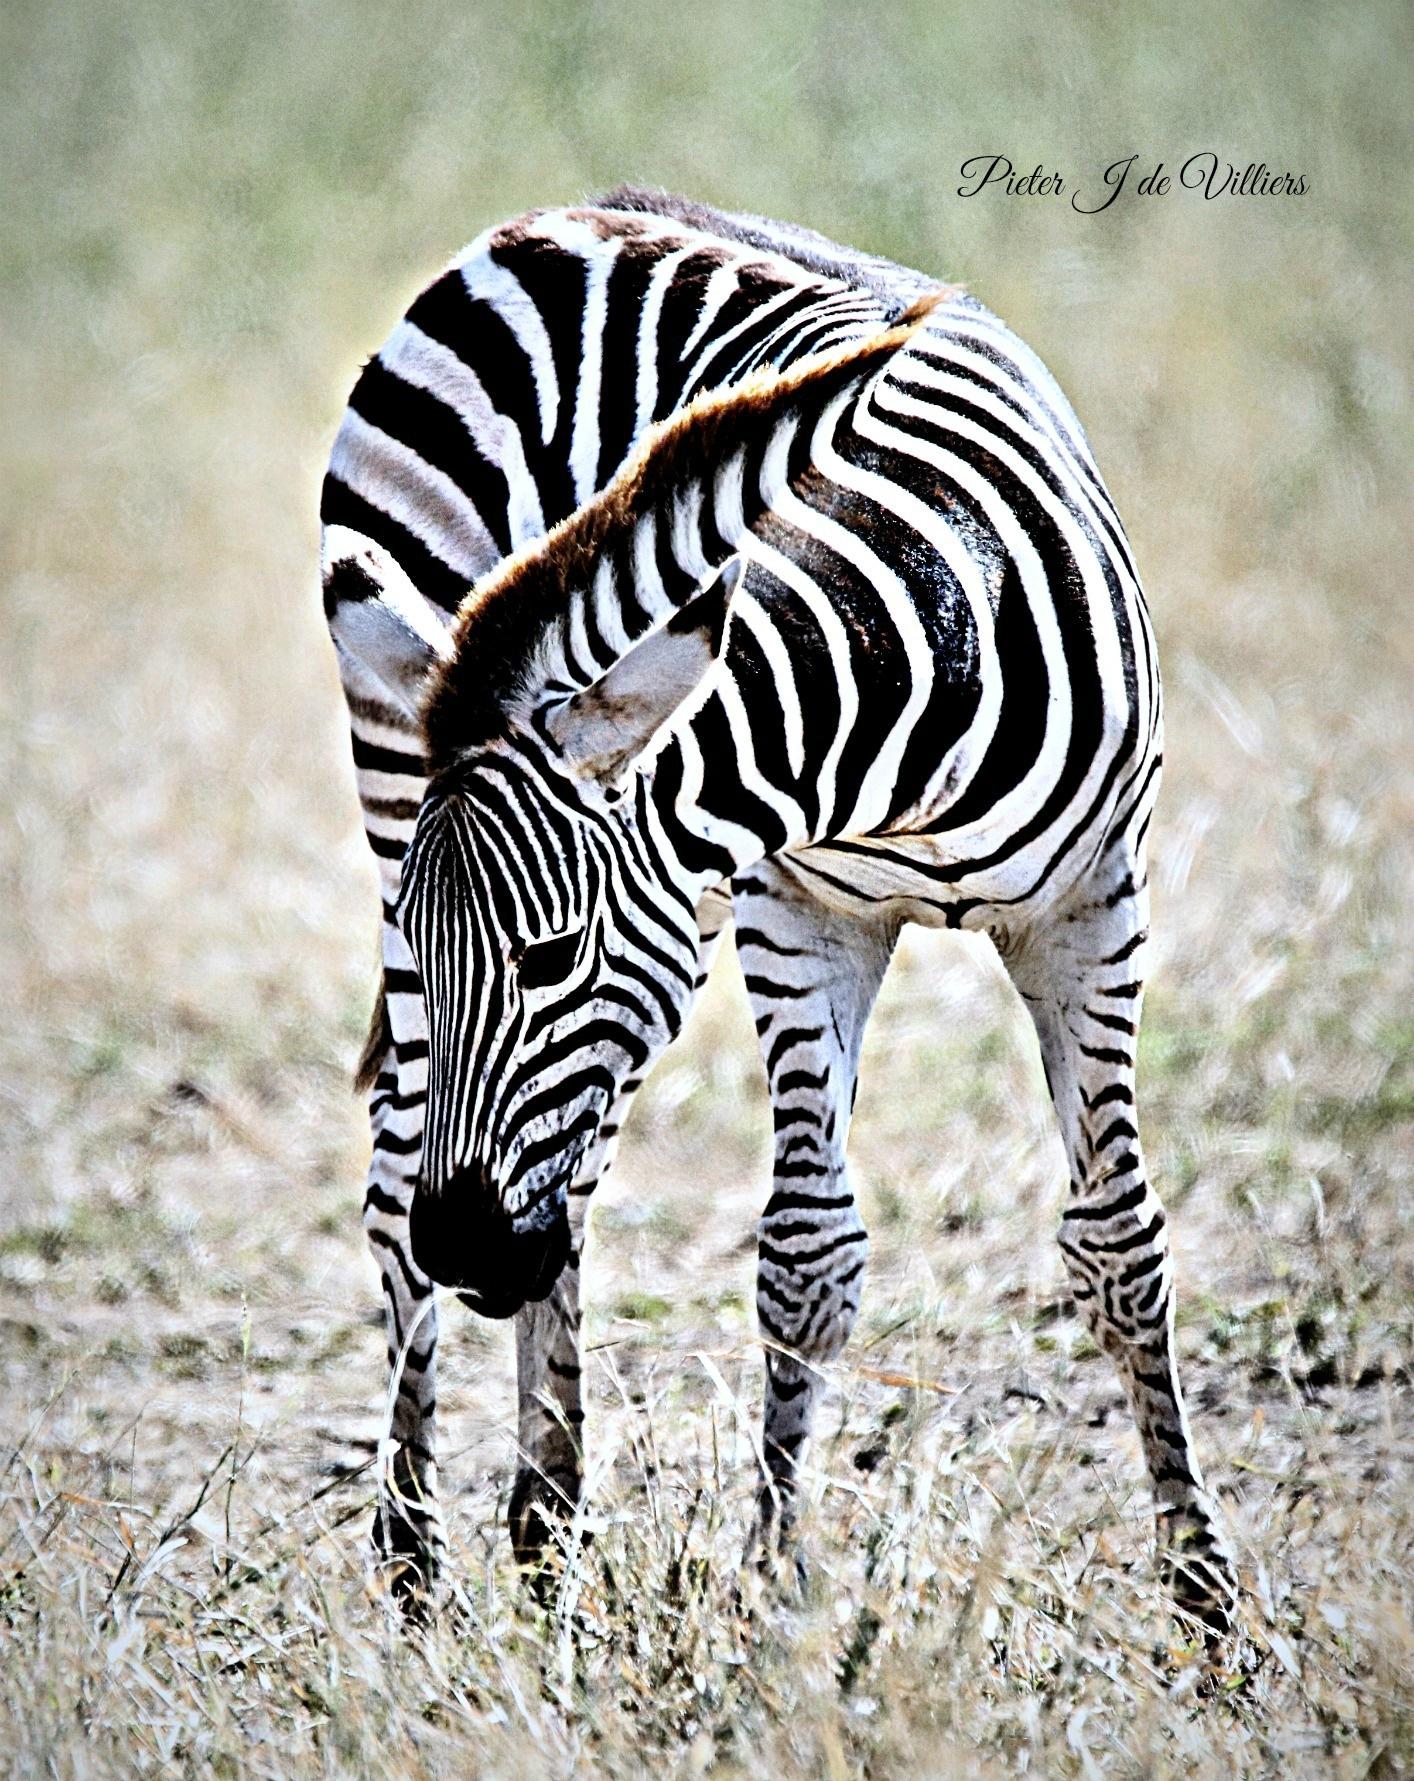 Young Zebra by Pieter J de Villiers